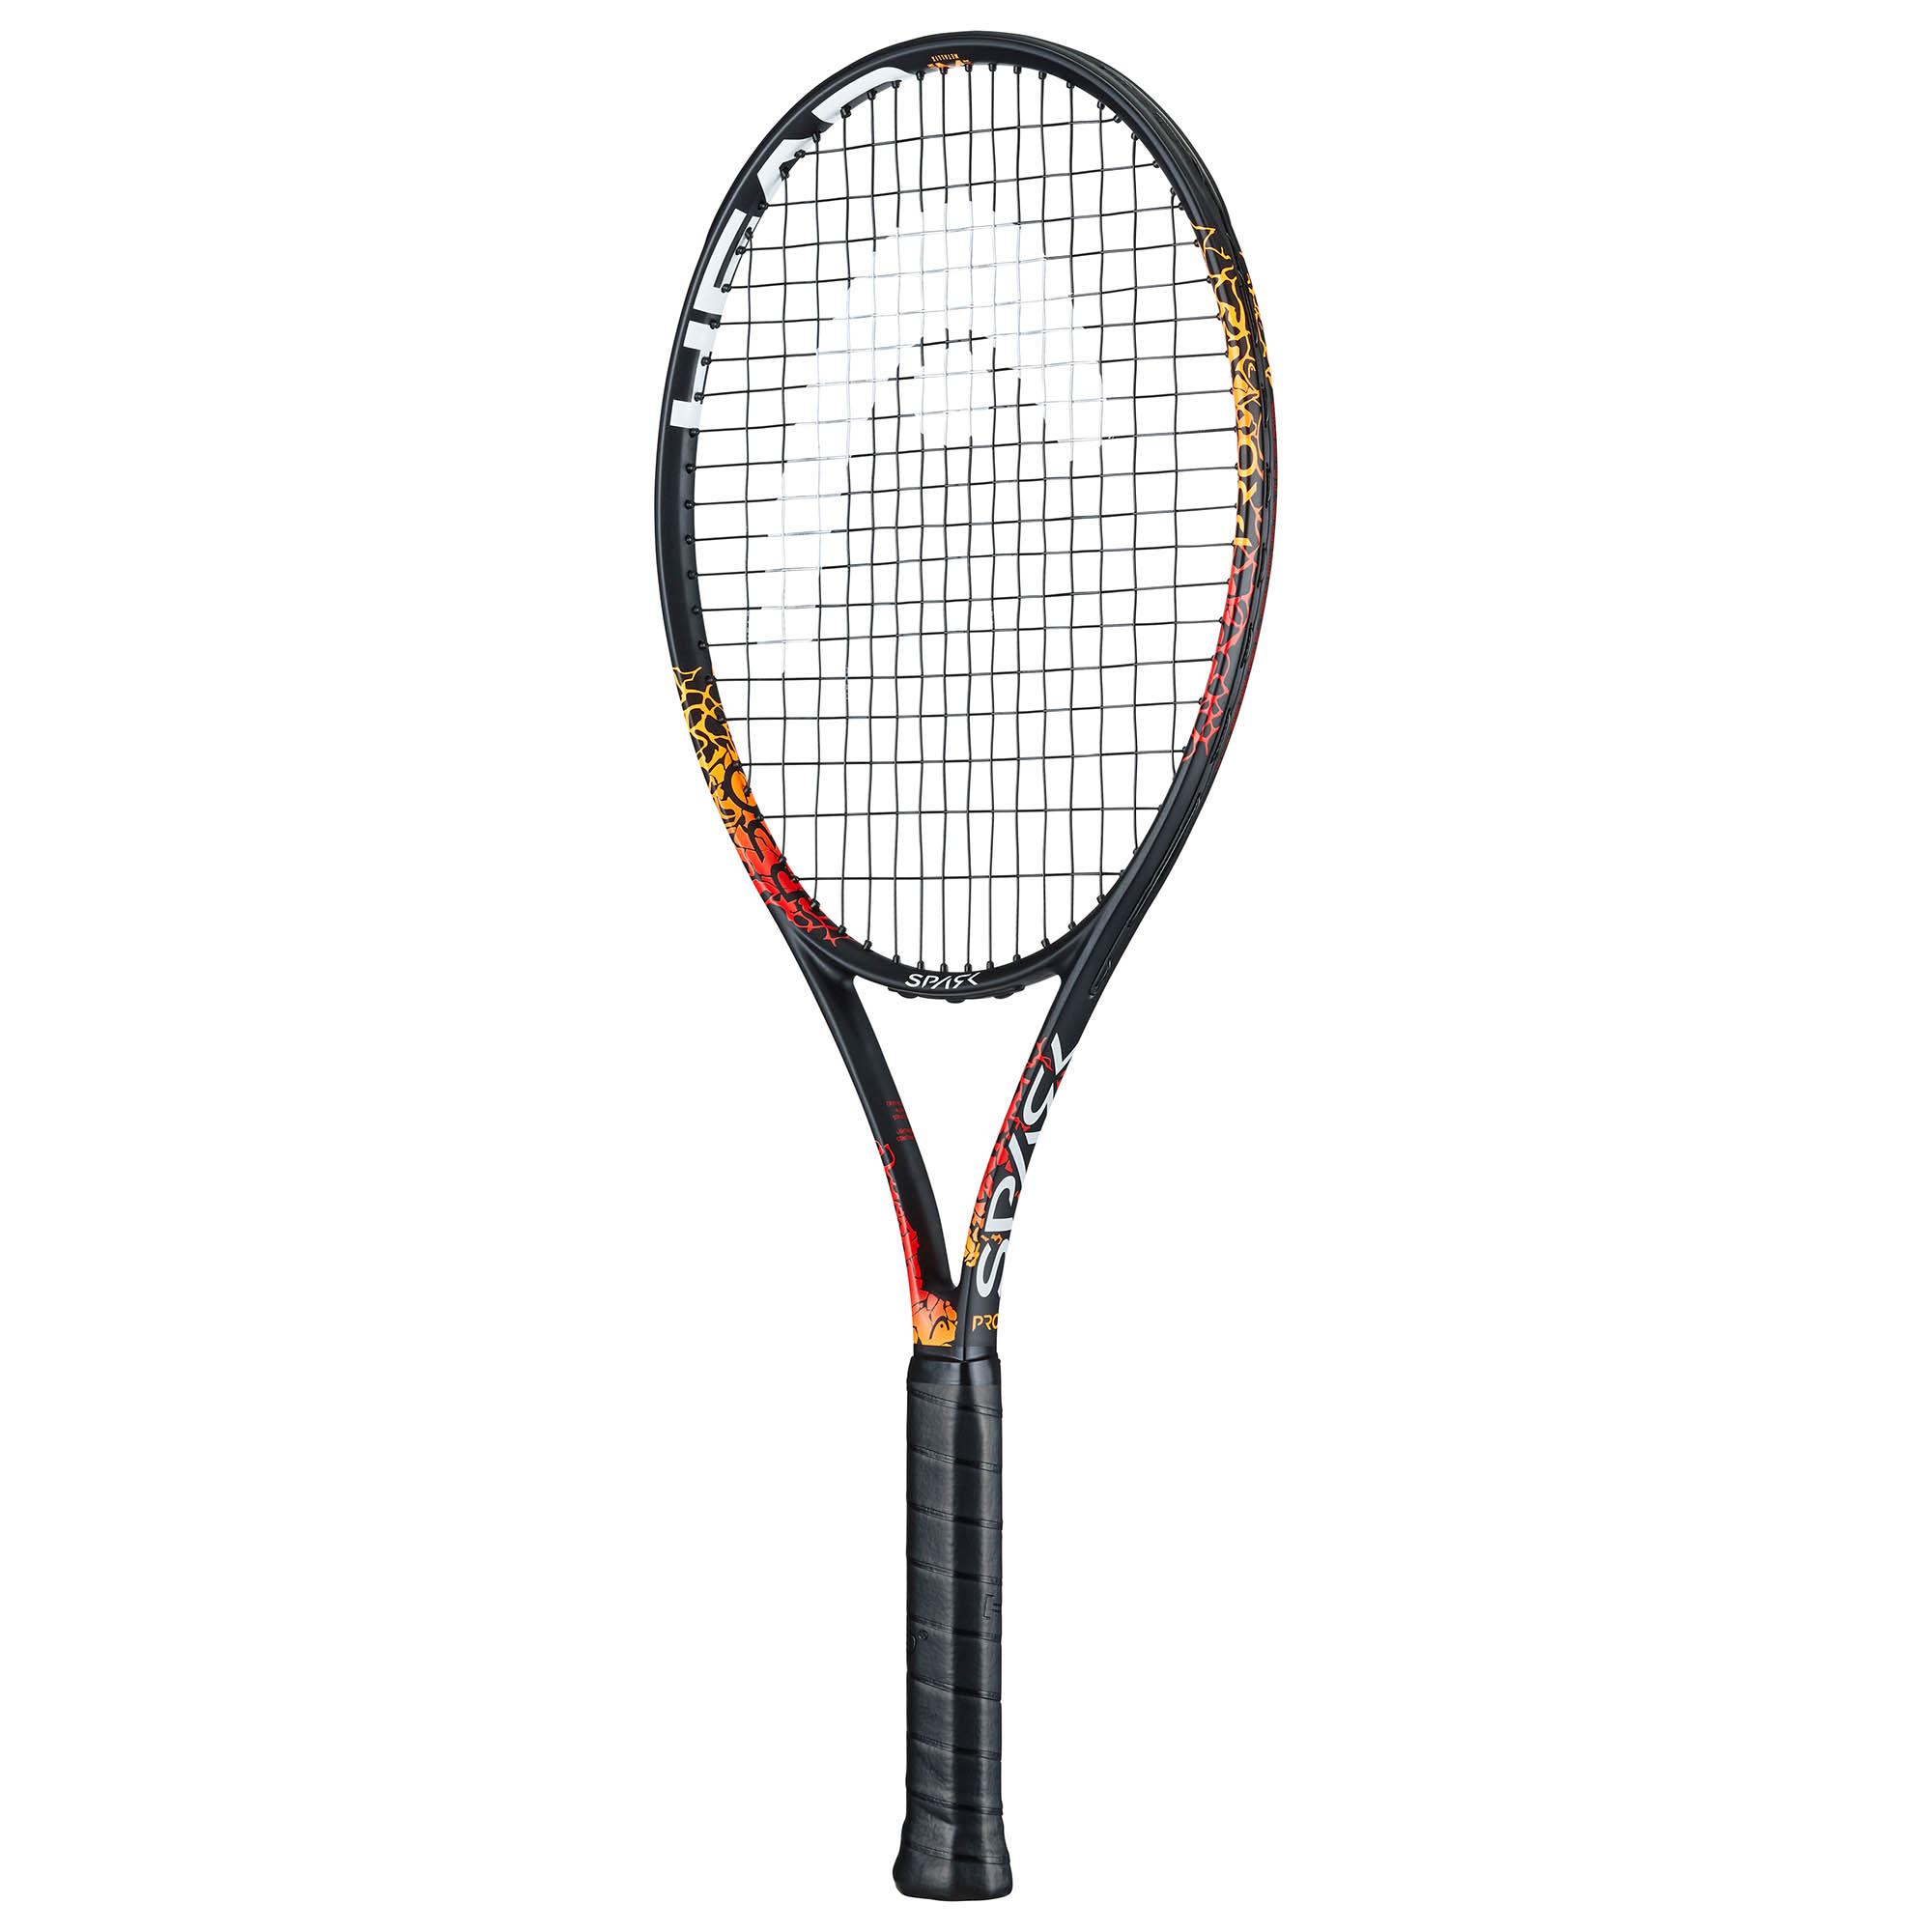 Head MX Spark Pro Tennis Racket - Grip 2